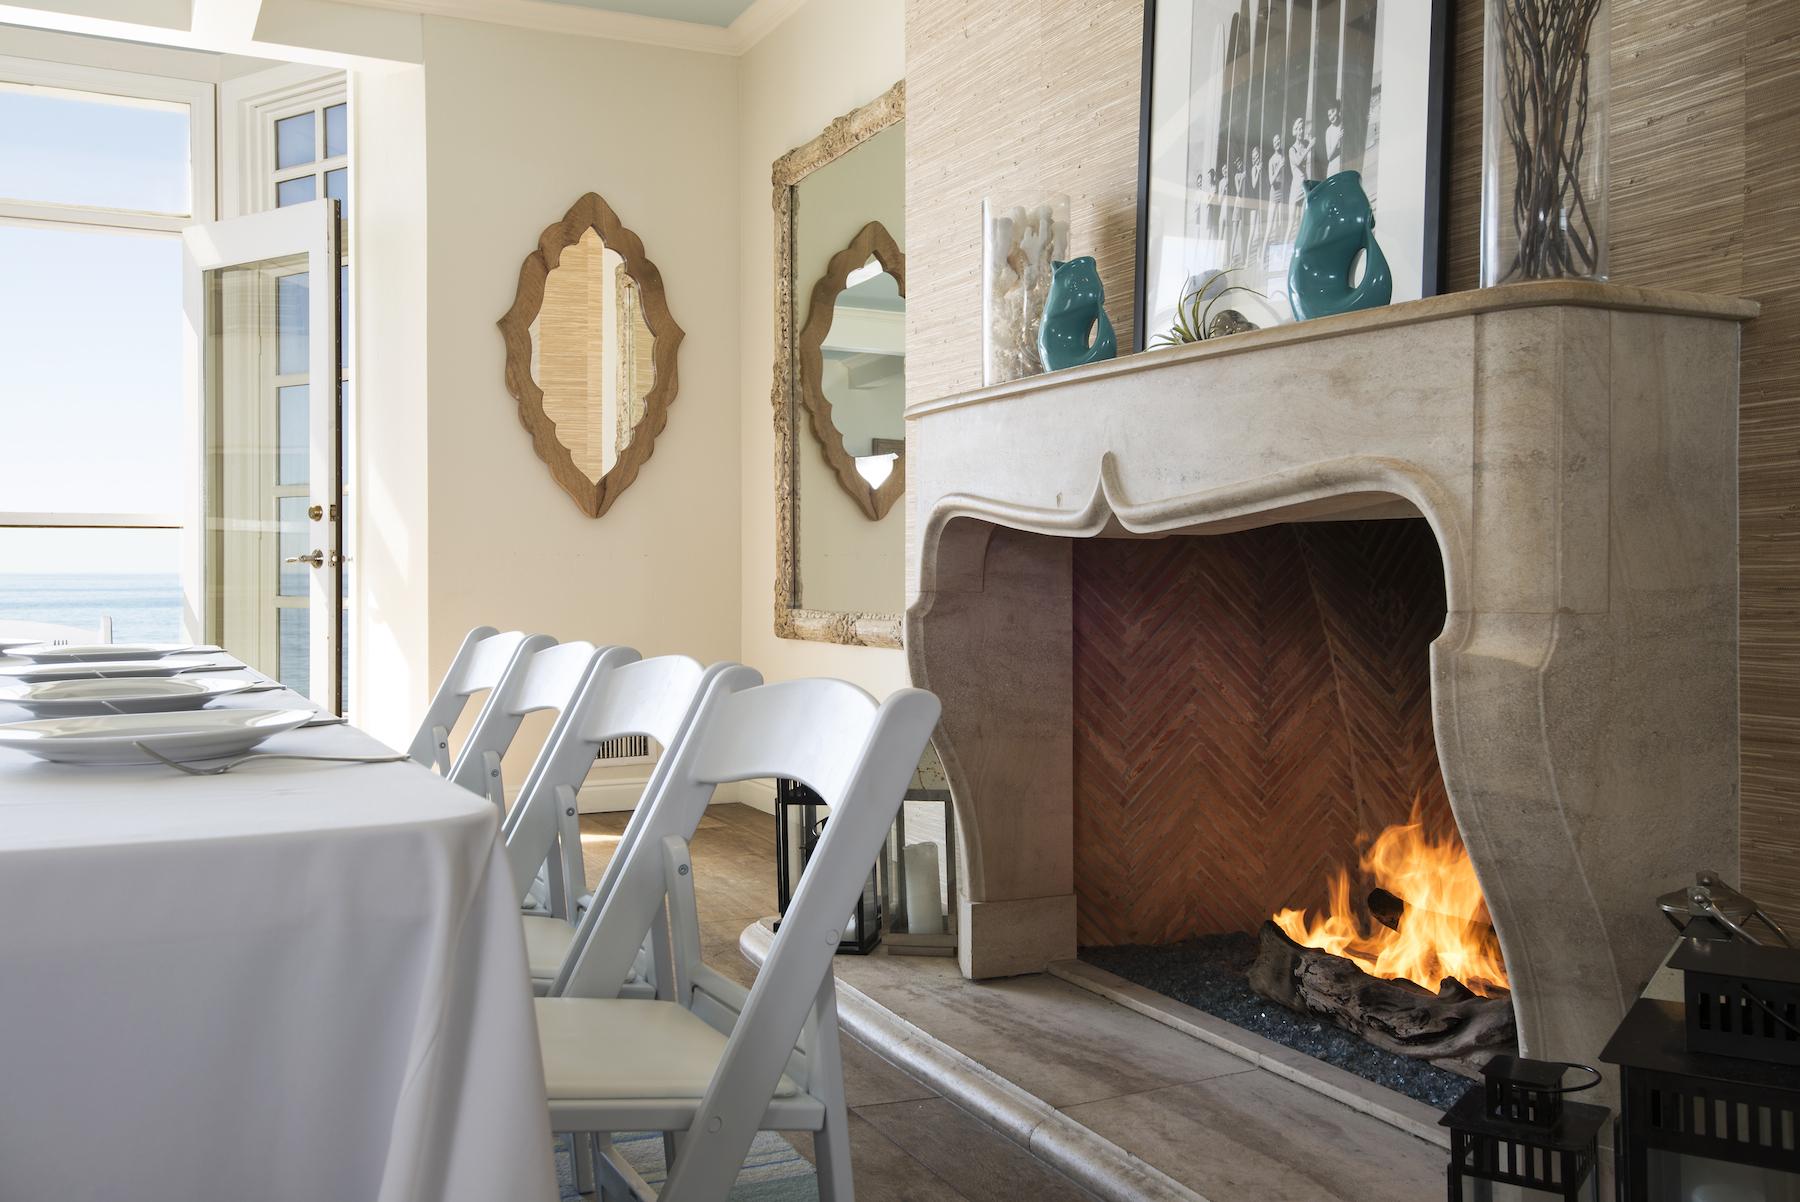 Pacific-Edge-Hotel-Laguna-Beach-Living-Room-Fireplace-Detail.JPG